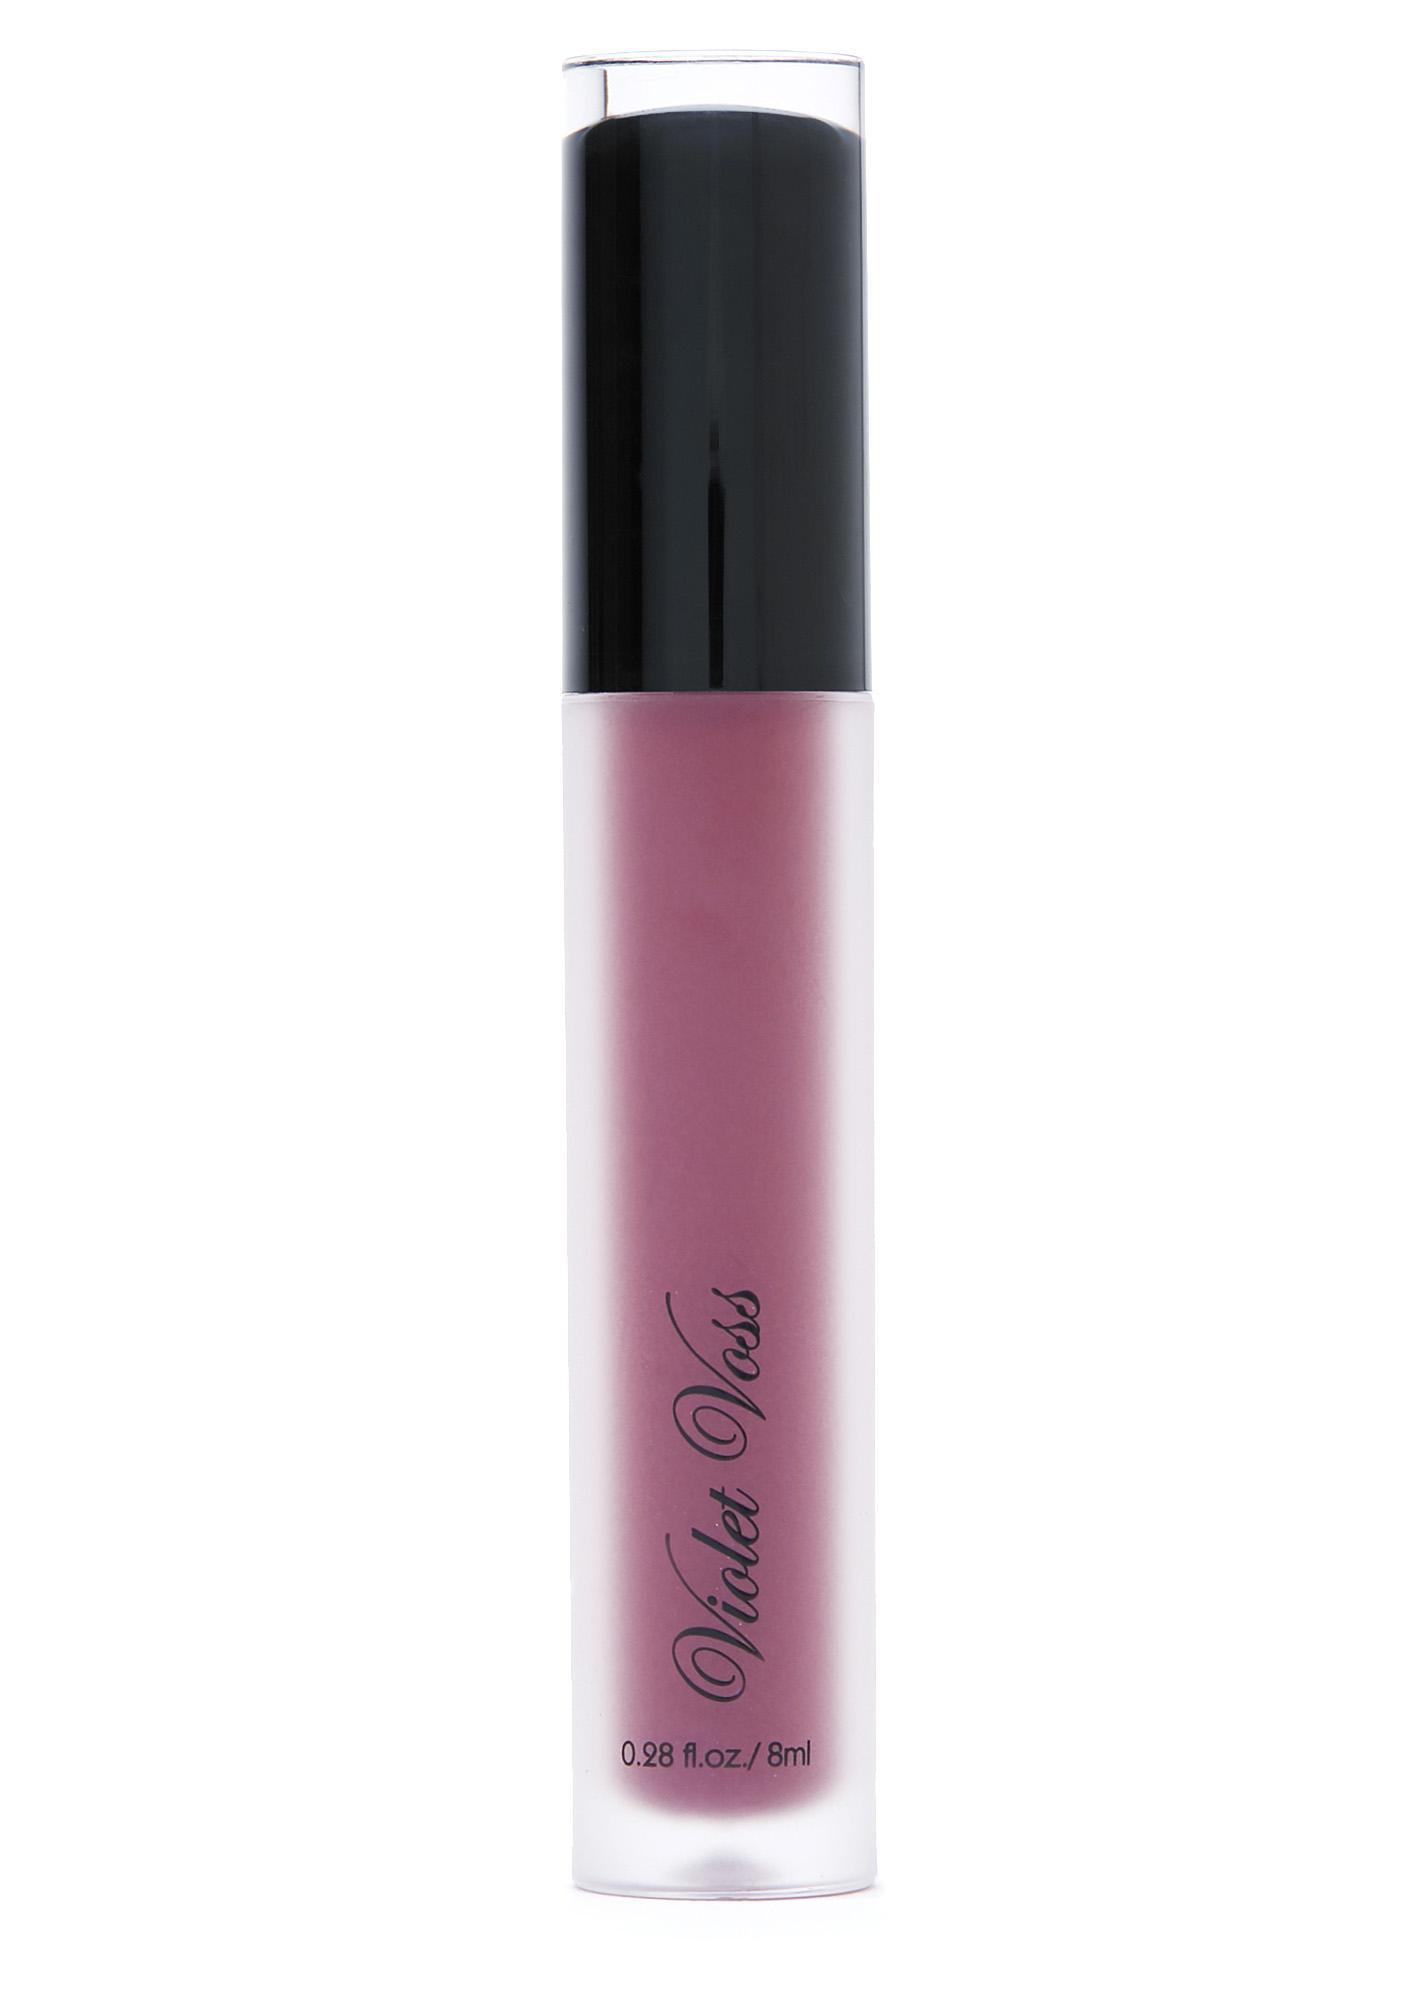 Violet Voss Vanity Matte Liquid Lipstick